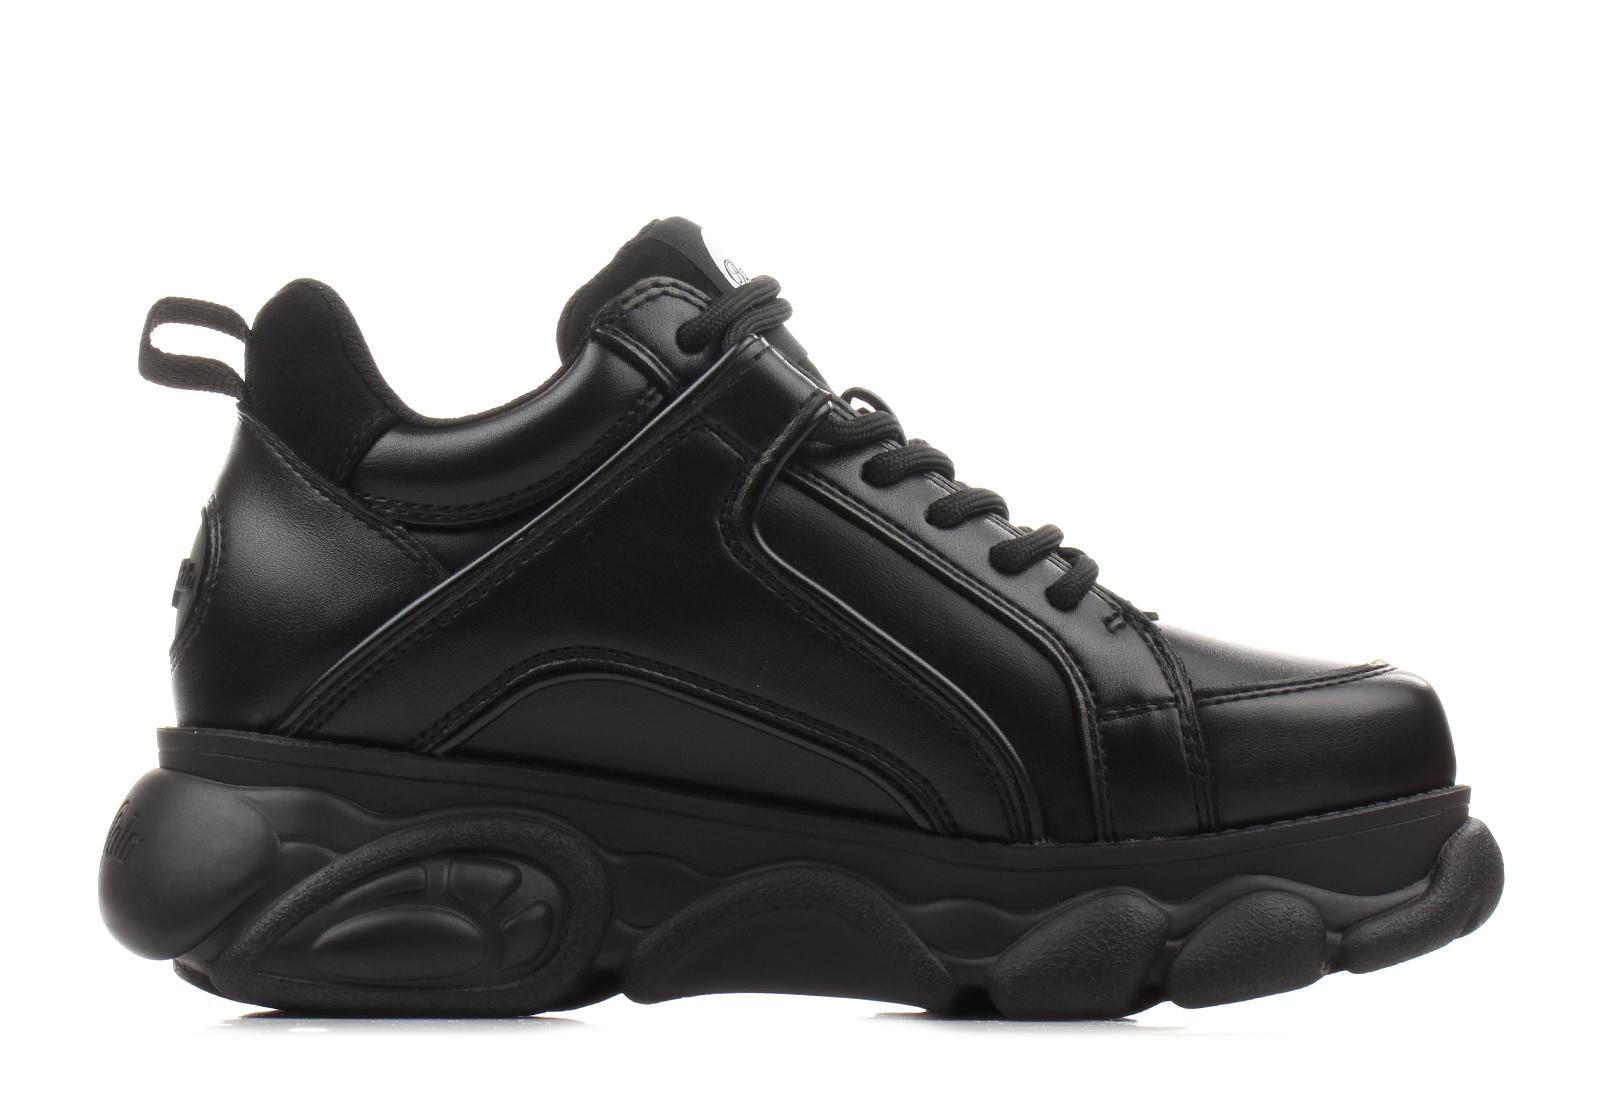 Buffalo Shoes Corin 1630120 Blk Online Shop For